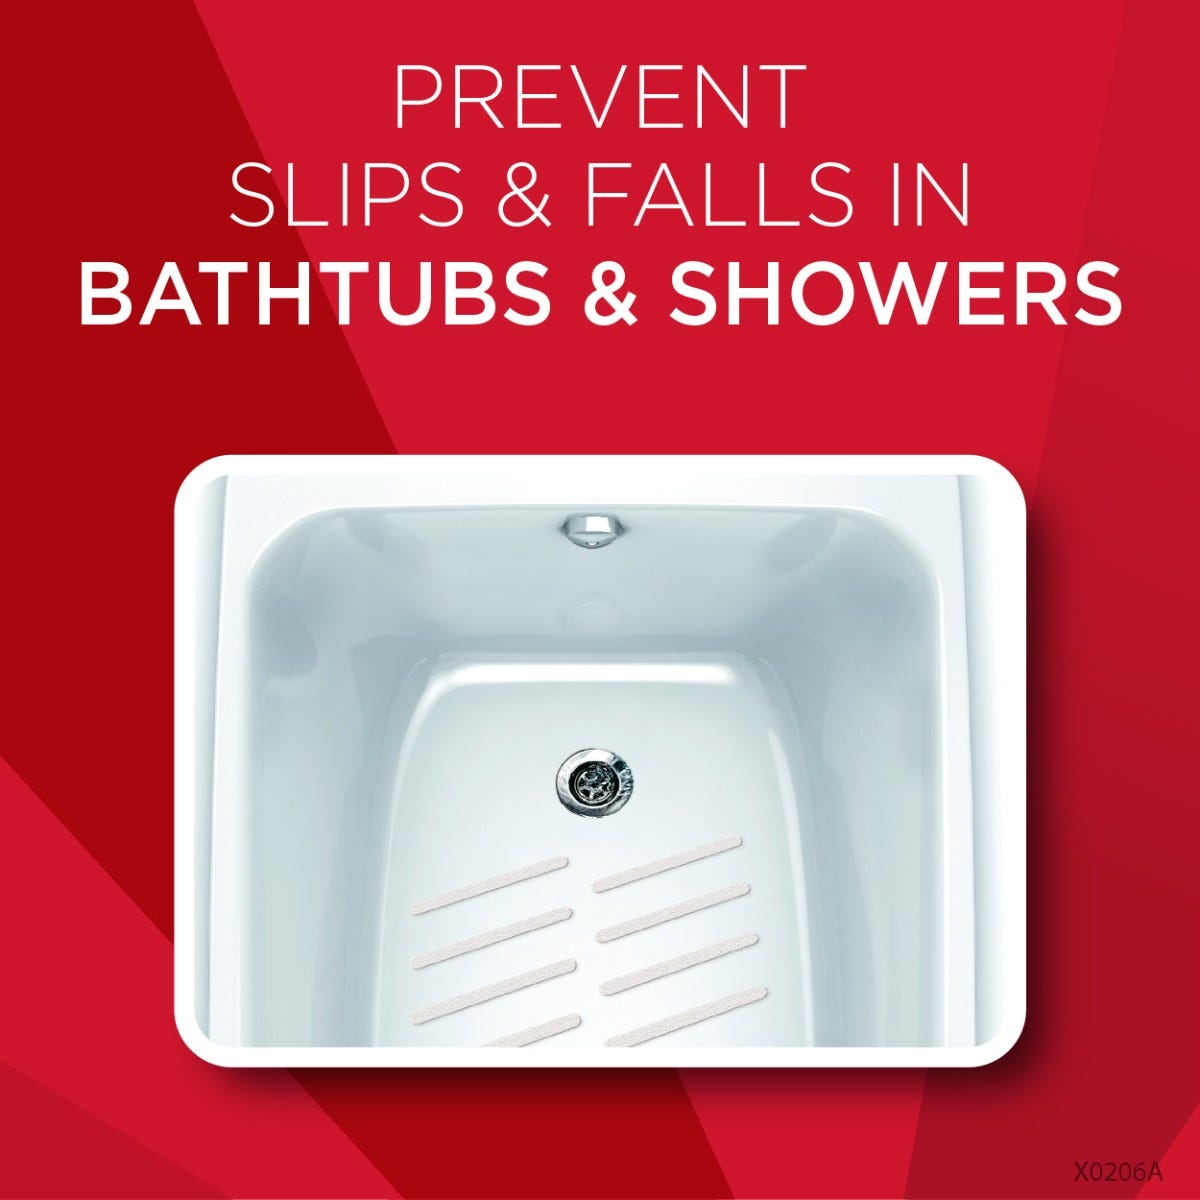 Prevent bathtub falls